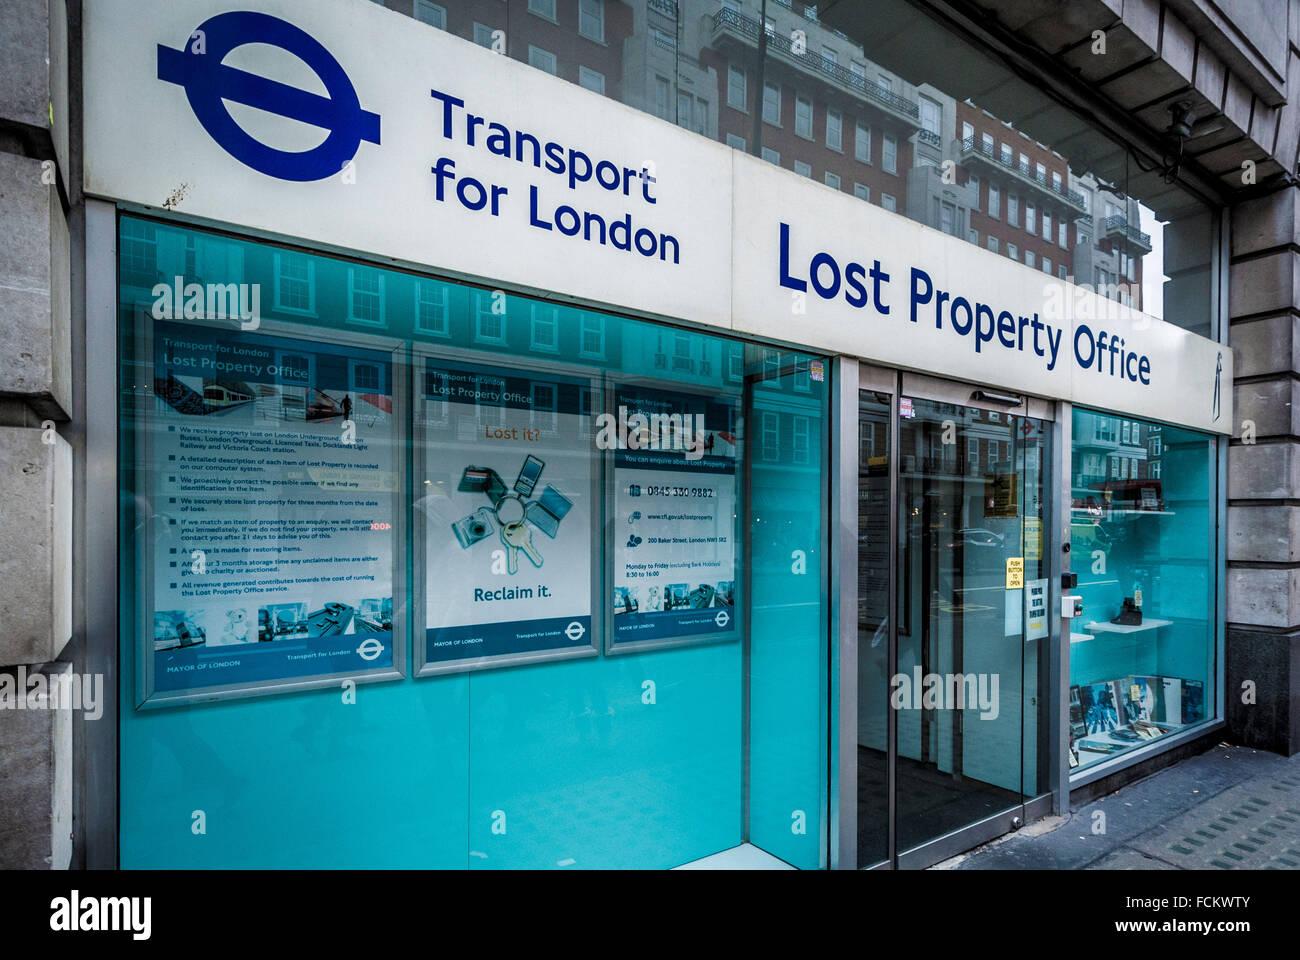 Transport For London Fundbüro, London, UK. Stockbild